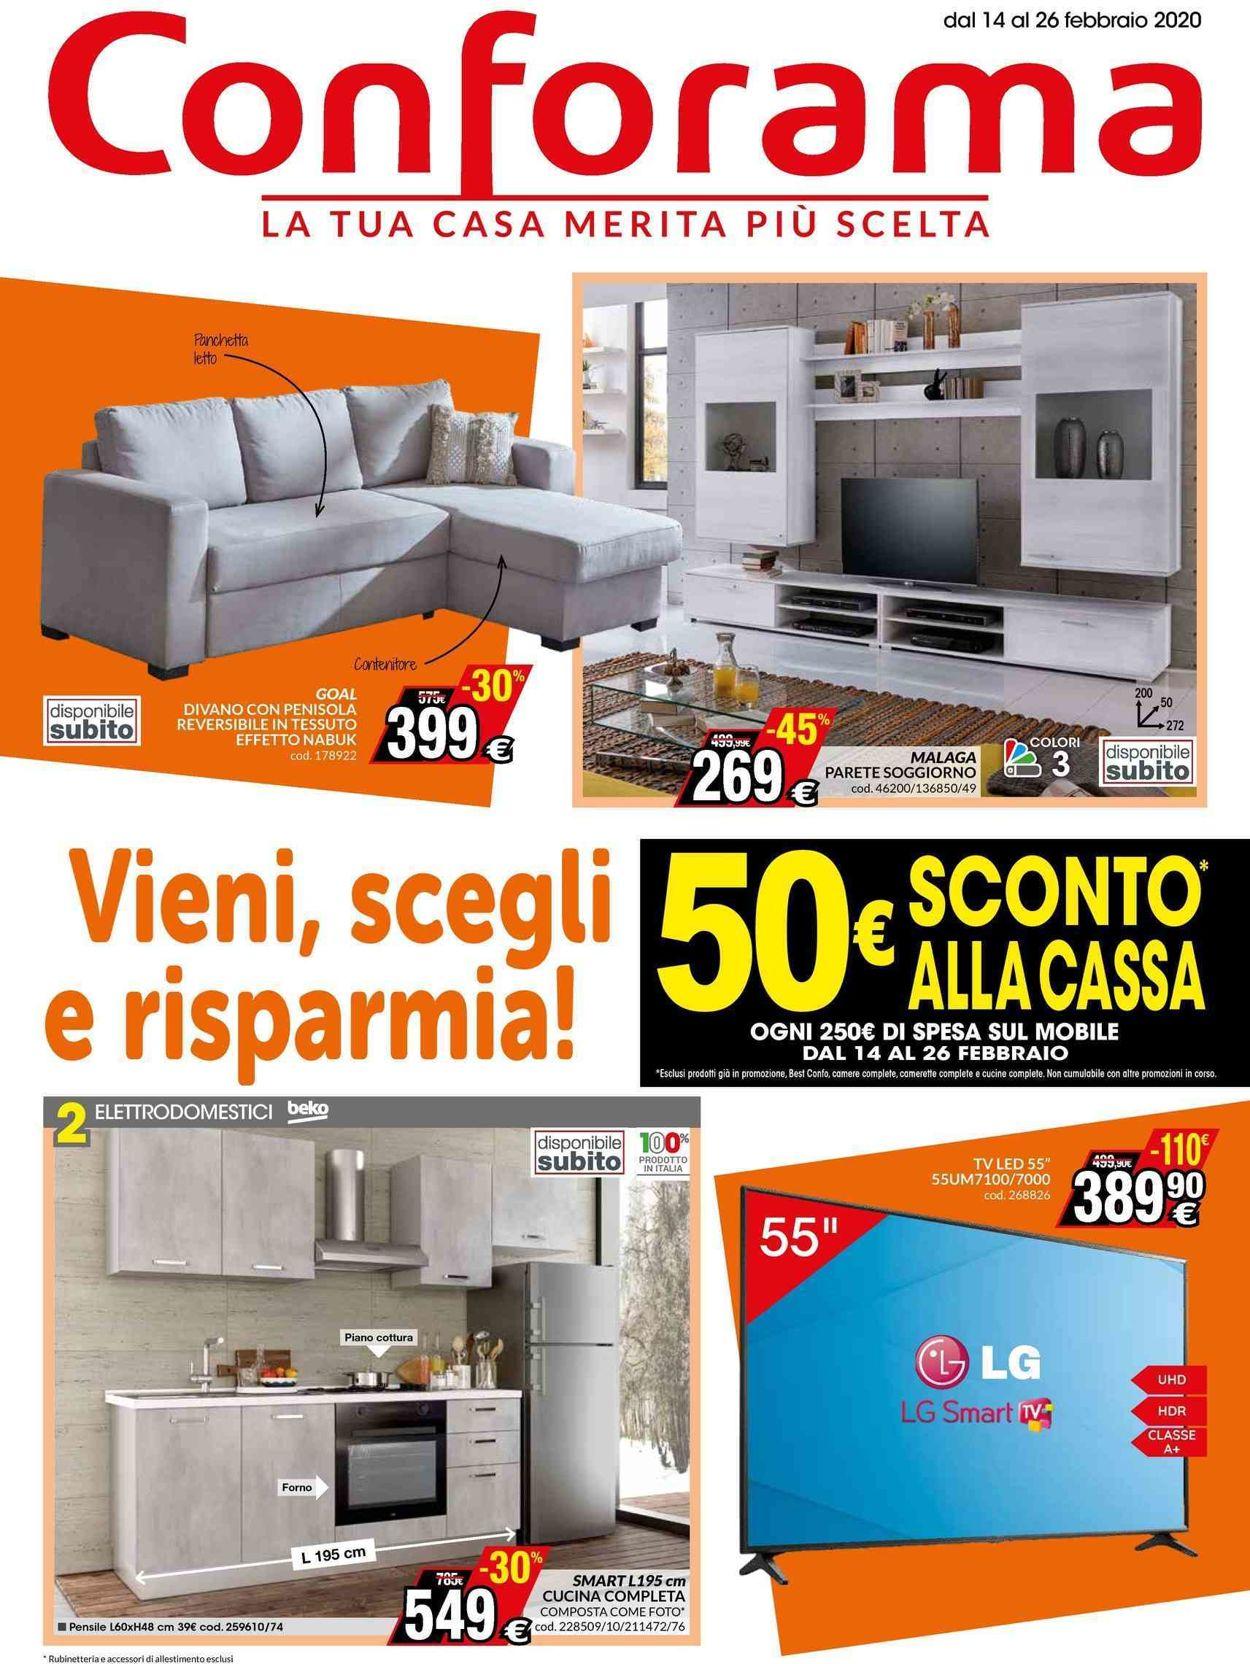 Volantino Conforama - Offerte 14/02-26/02/2020